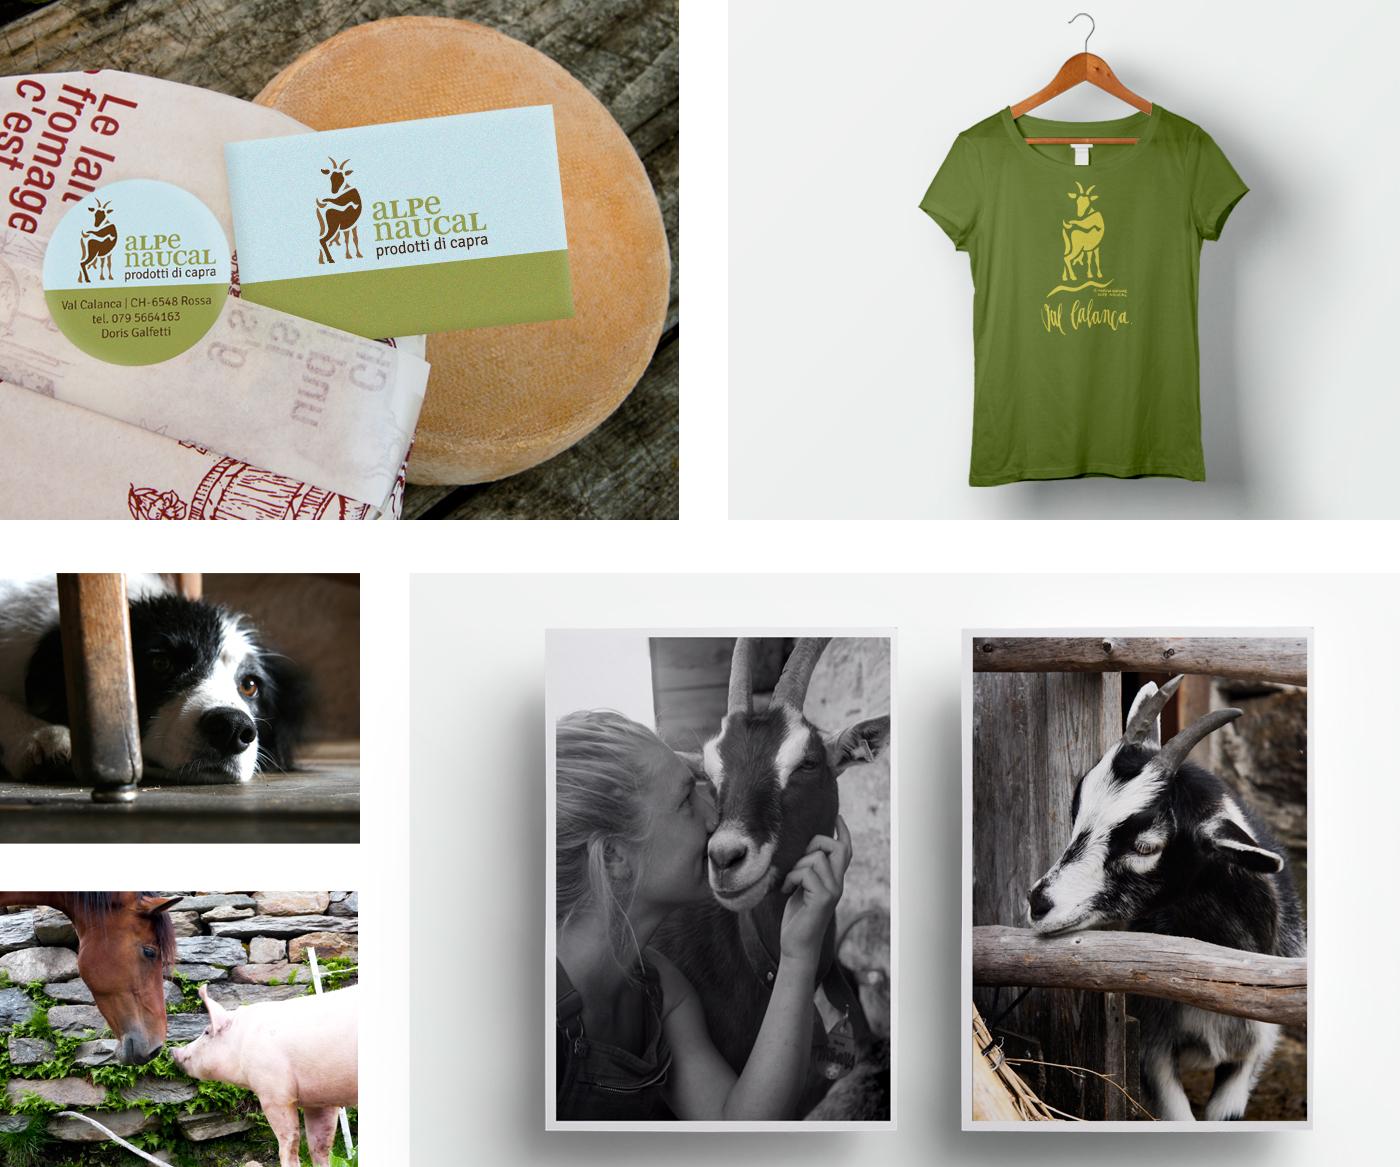 alpe-naucal_shirt_postkarte_etikett_visitenkarte_grafik_design_marina_marina_db